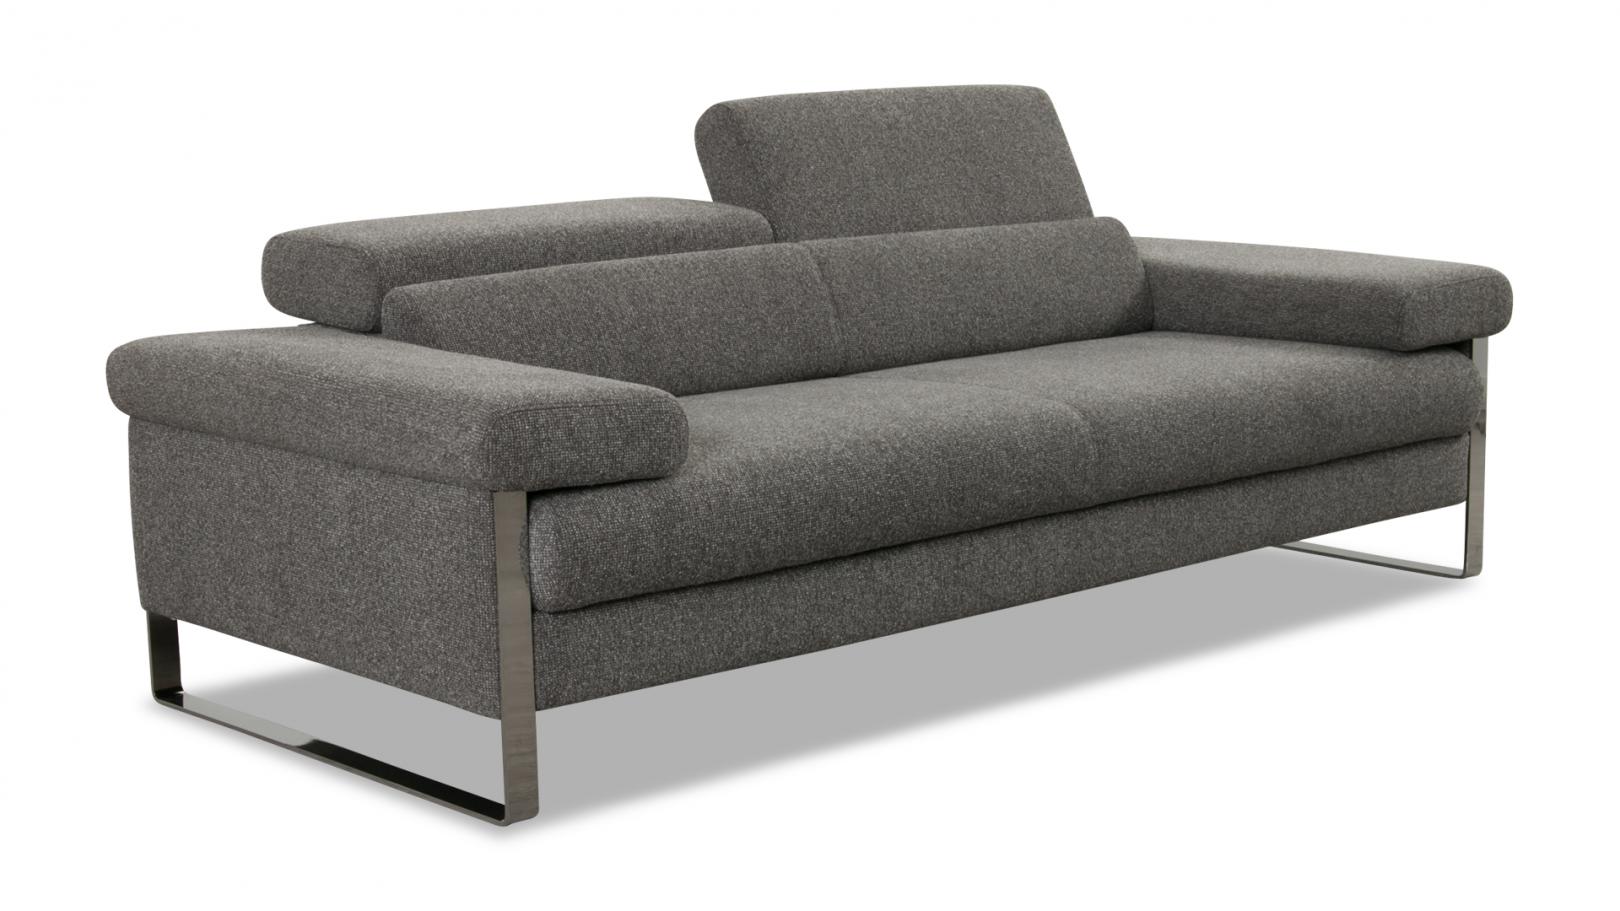 Willi Schillig Sofa 20974 Finn In Stoff S22 Steel In 2020 Schillig Sofa Sofa Sofa Outlet